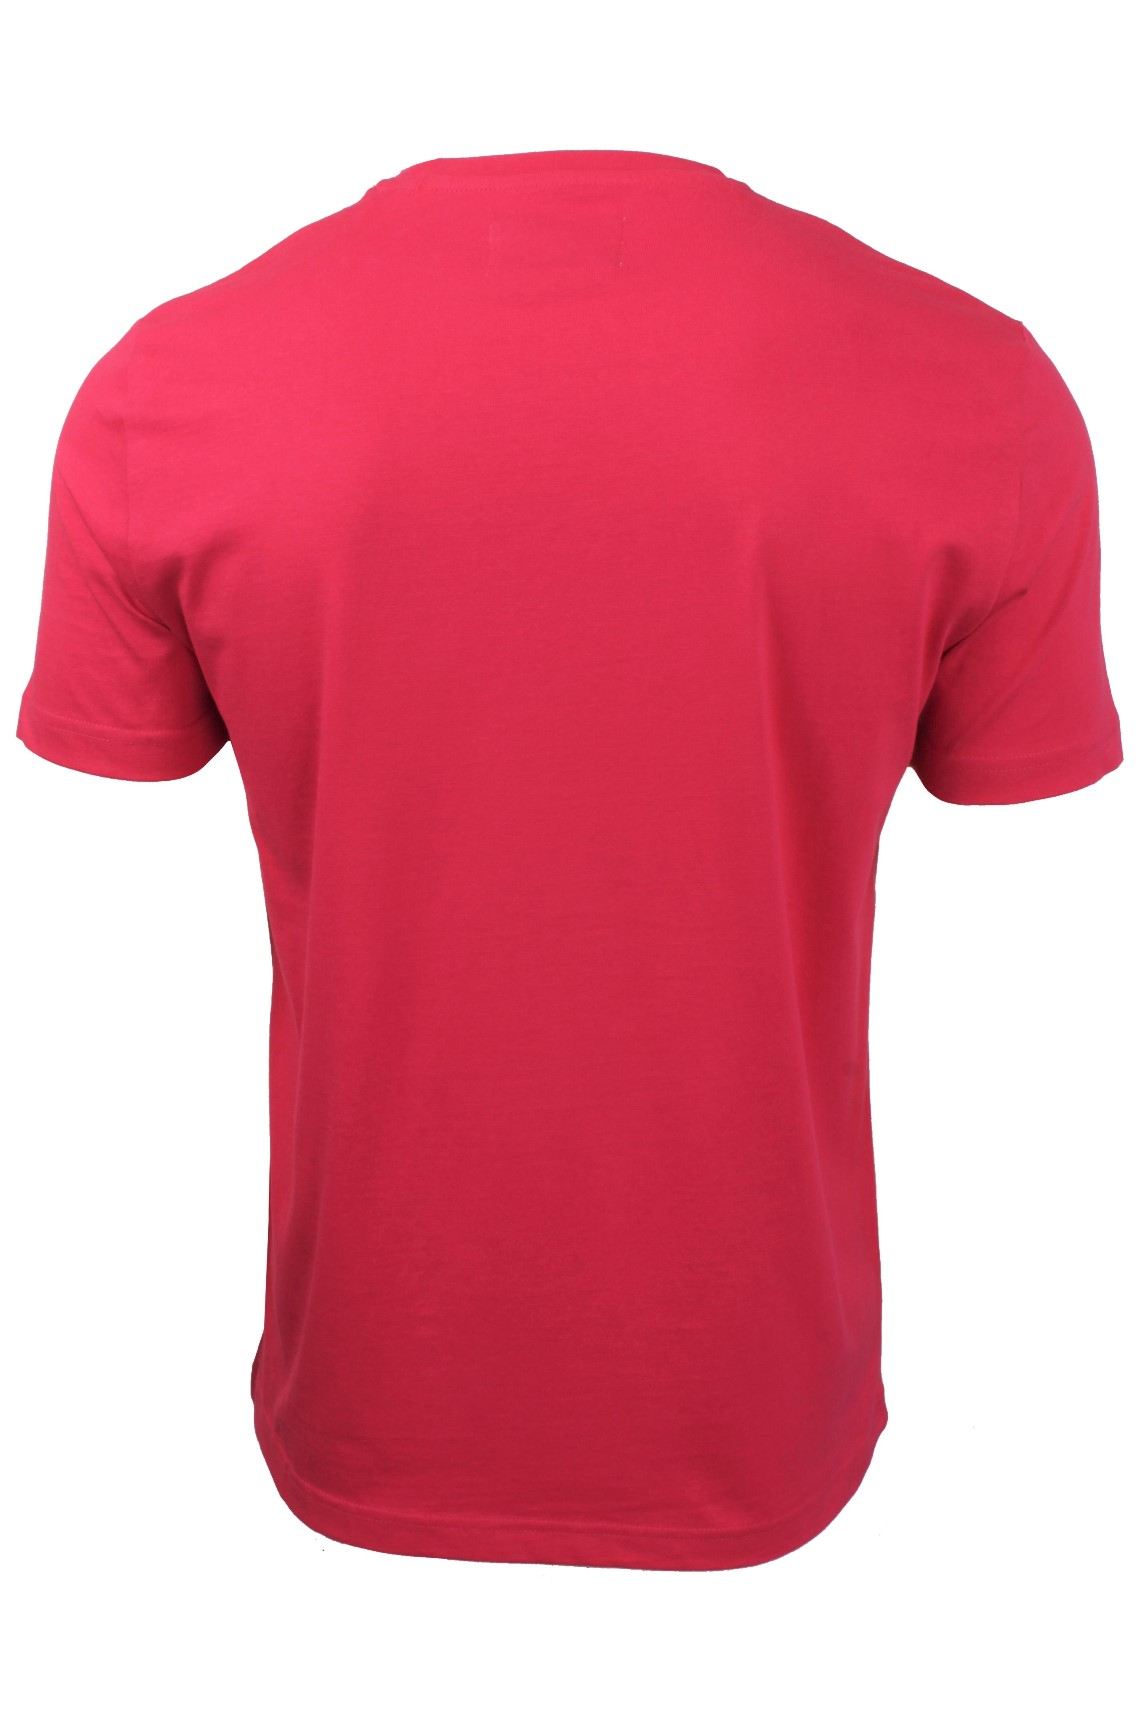 Mens-T-Shirt-by-Original-Penguin-Crew-Neck-Short-Sleeved thumbnail 41